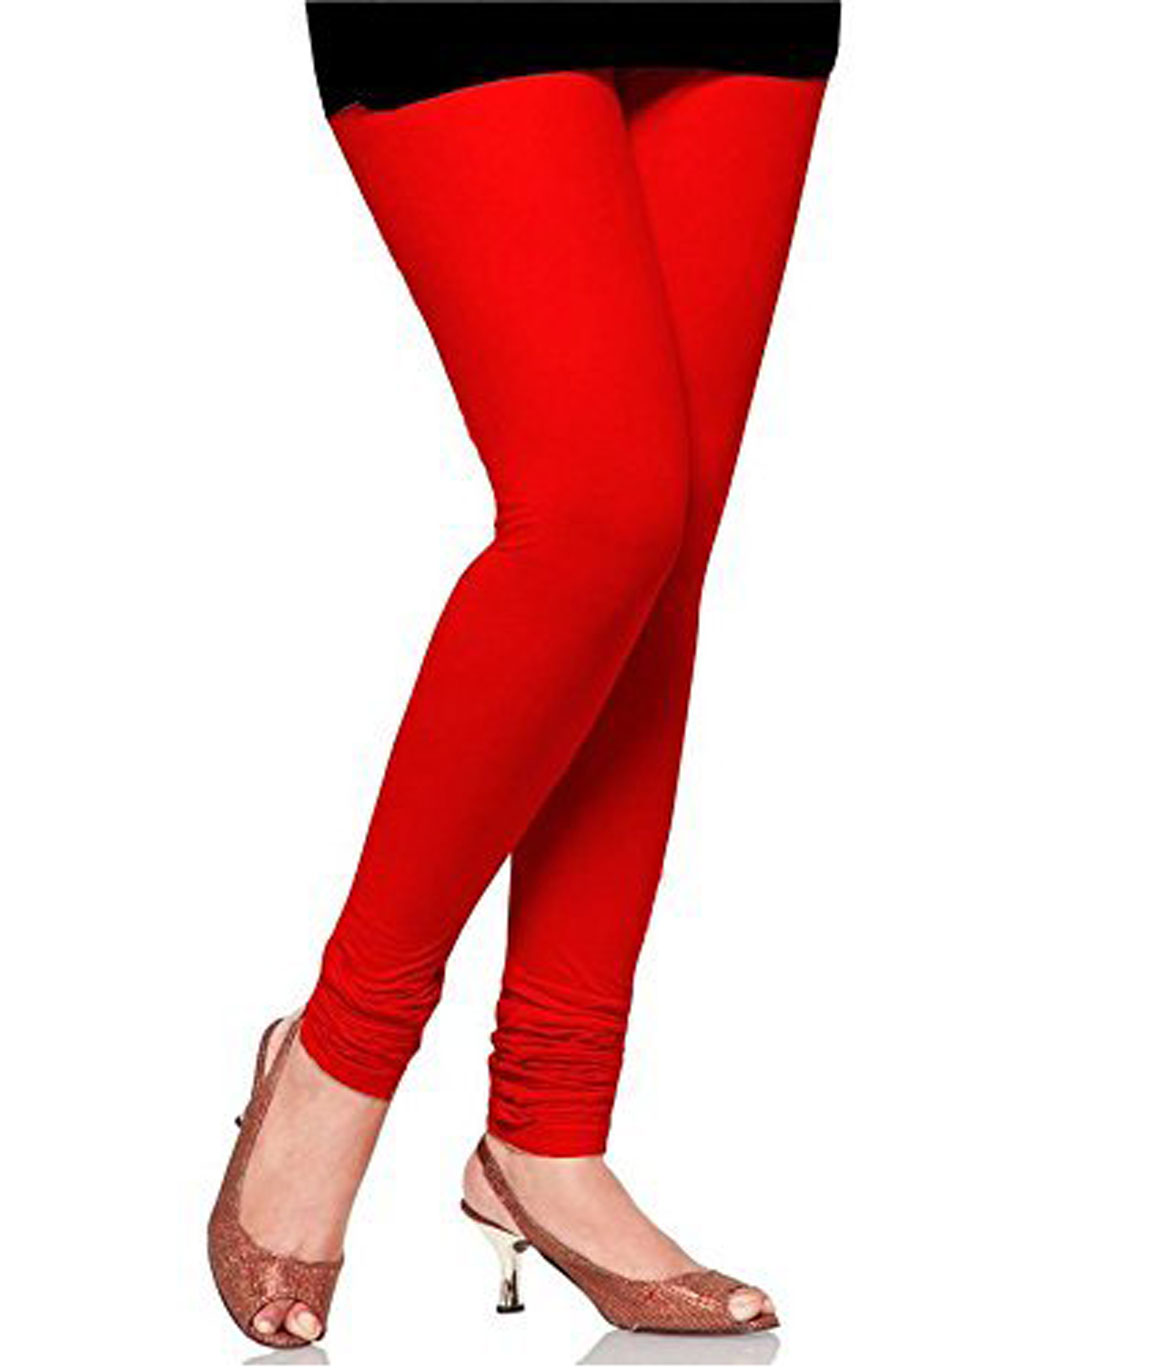 Swag  Leggings Churidar comfortable for girls stylish and soft leggings(red)